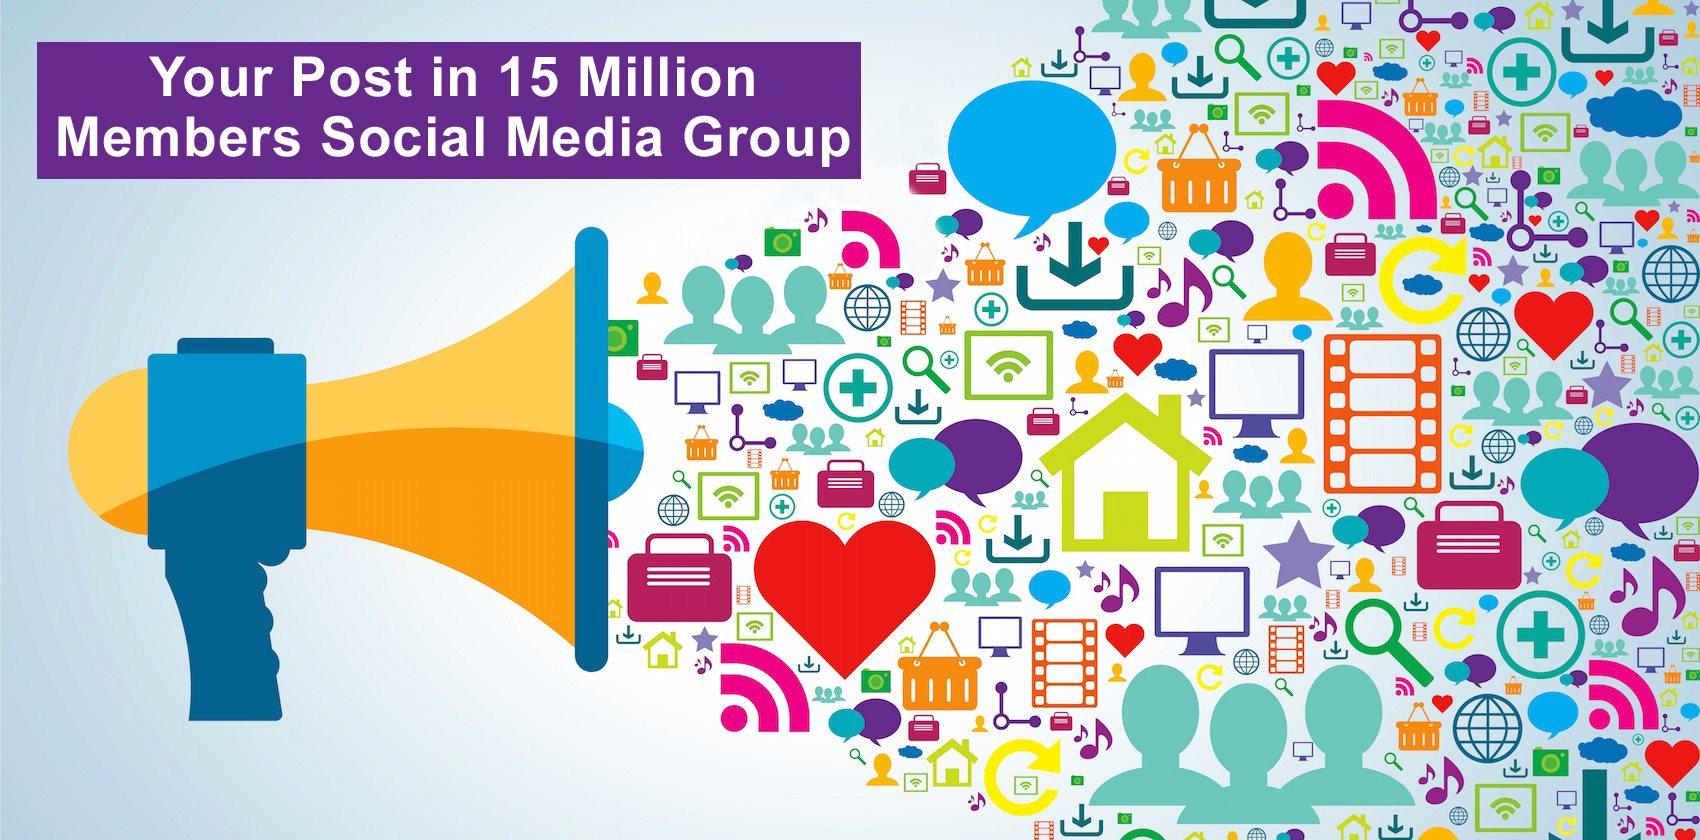 Get your post in 15 million members Social Media Groups